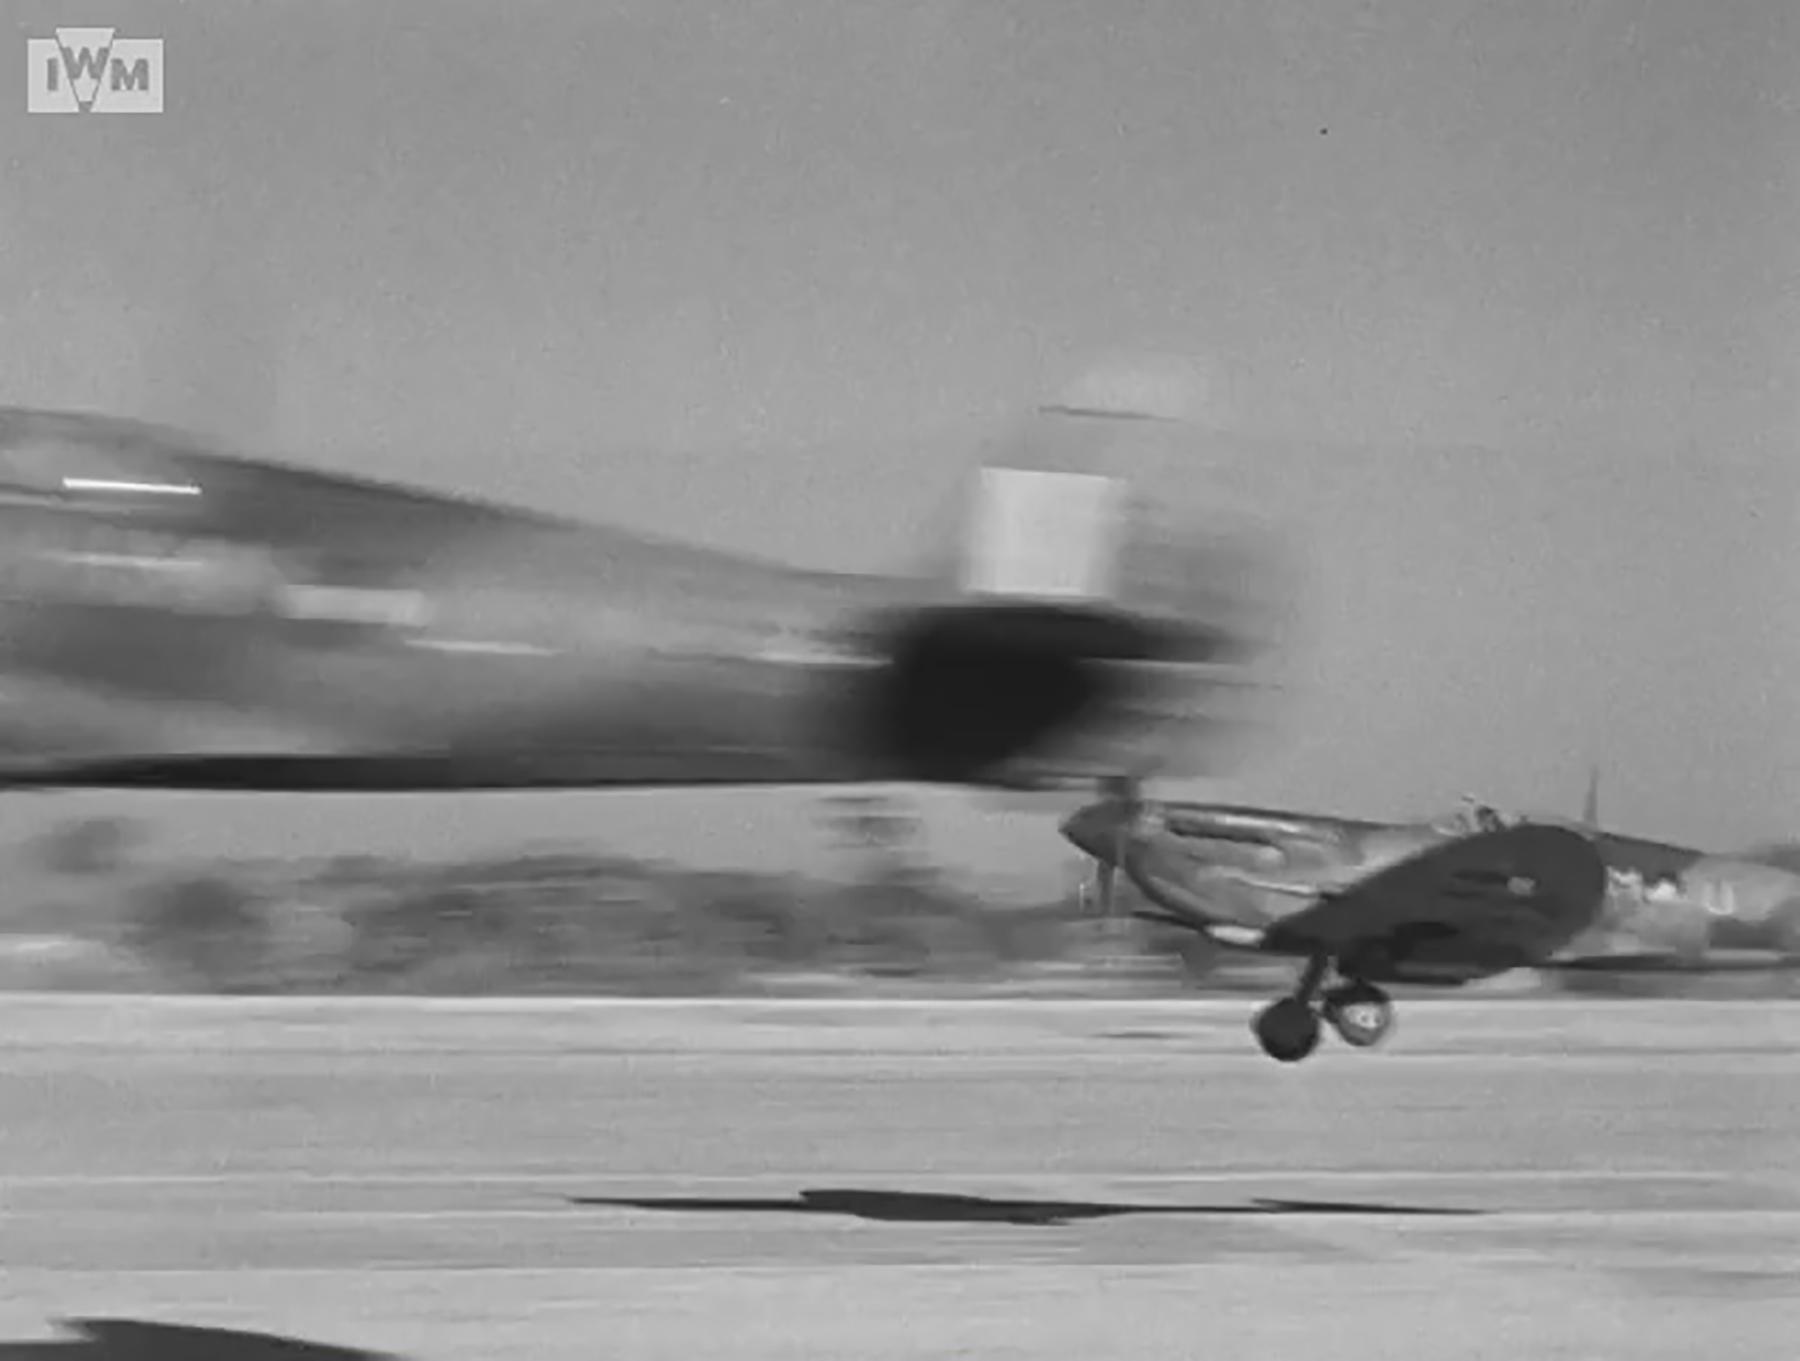 Spitfire VIII RAF 136Sqn HMU taking off from Rumkhapalong operating over Burma CBI 1944 IWM 01